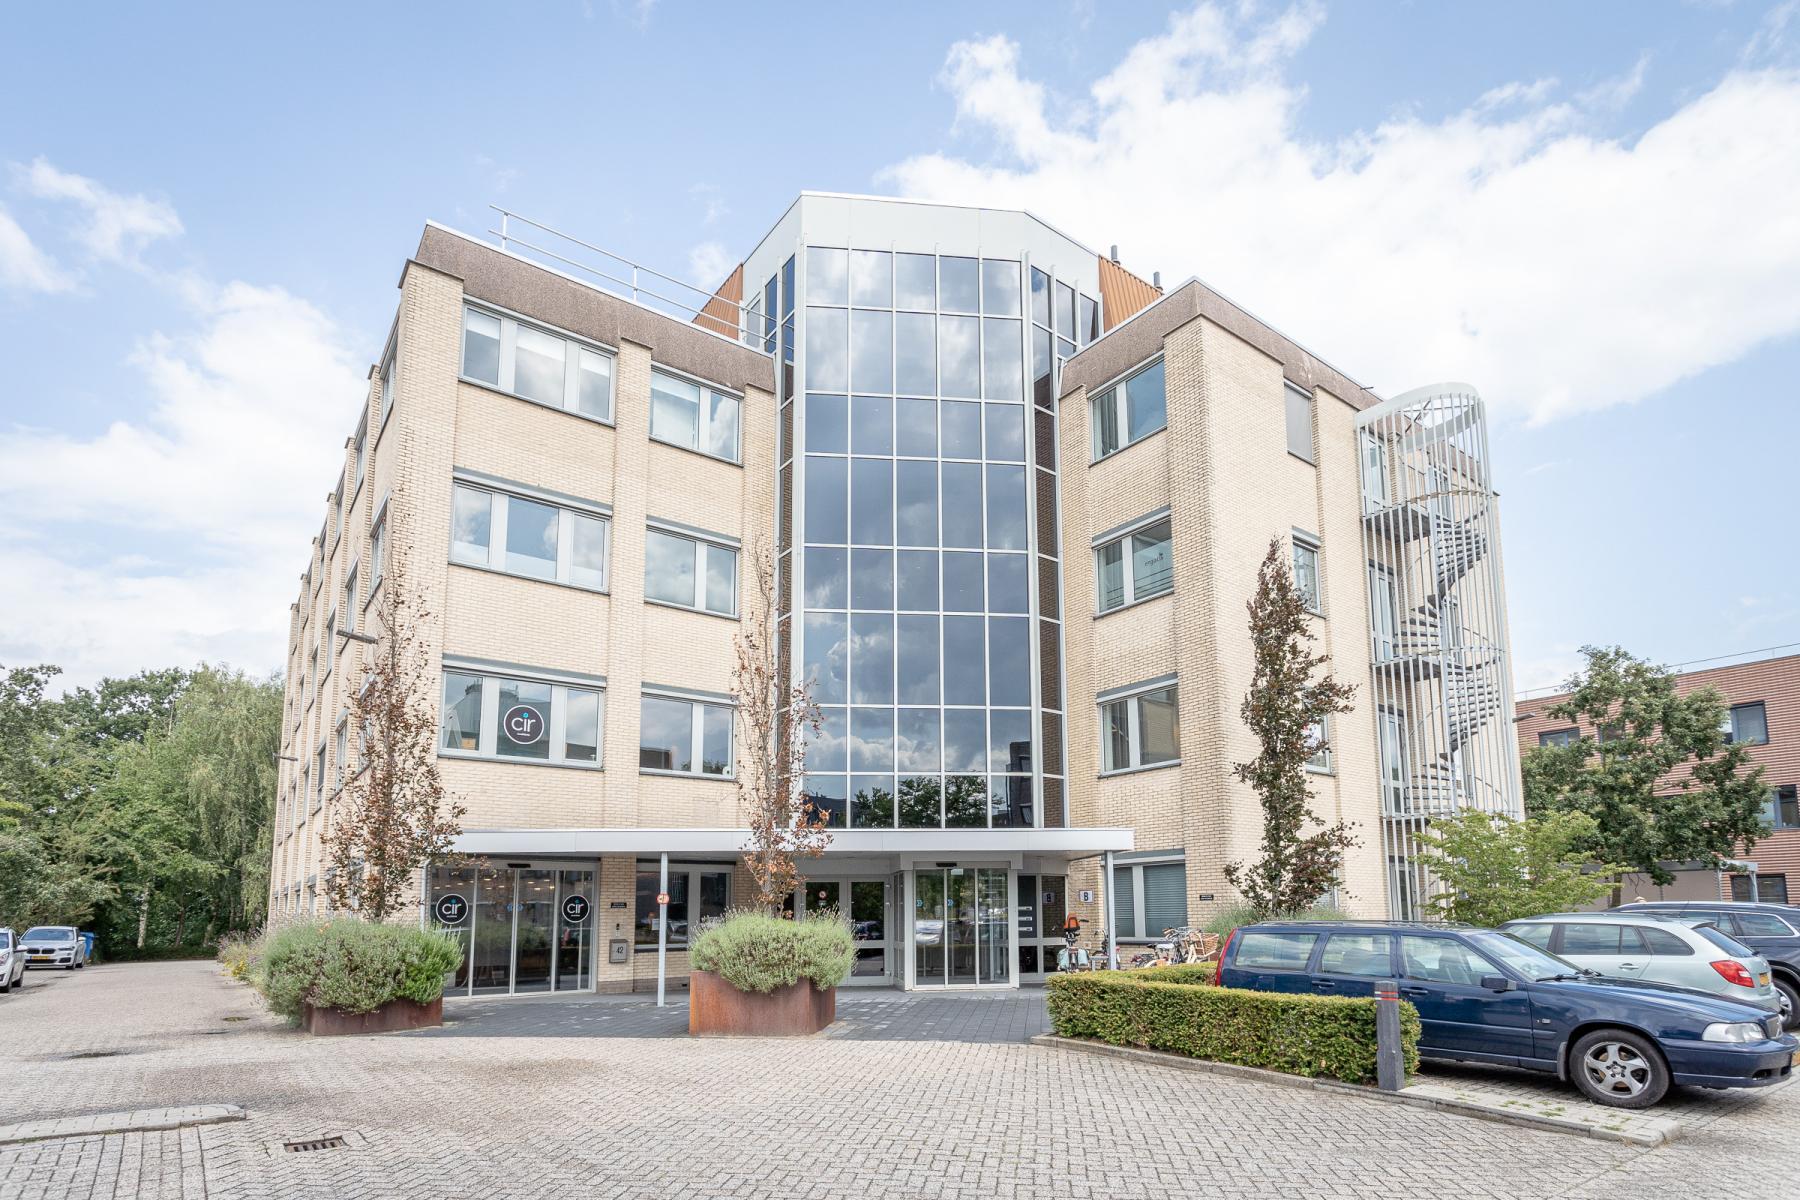 Rent office space Dokter Stolteweg 42, Zwolle (9)